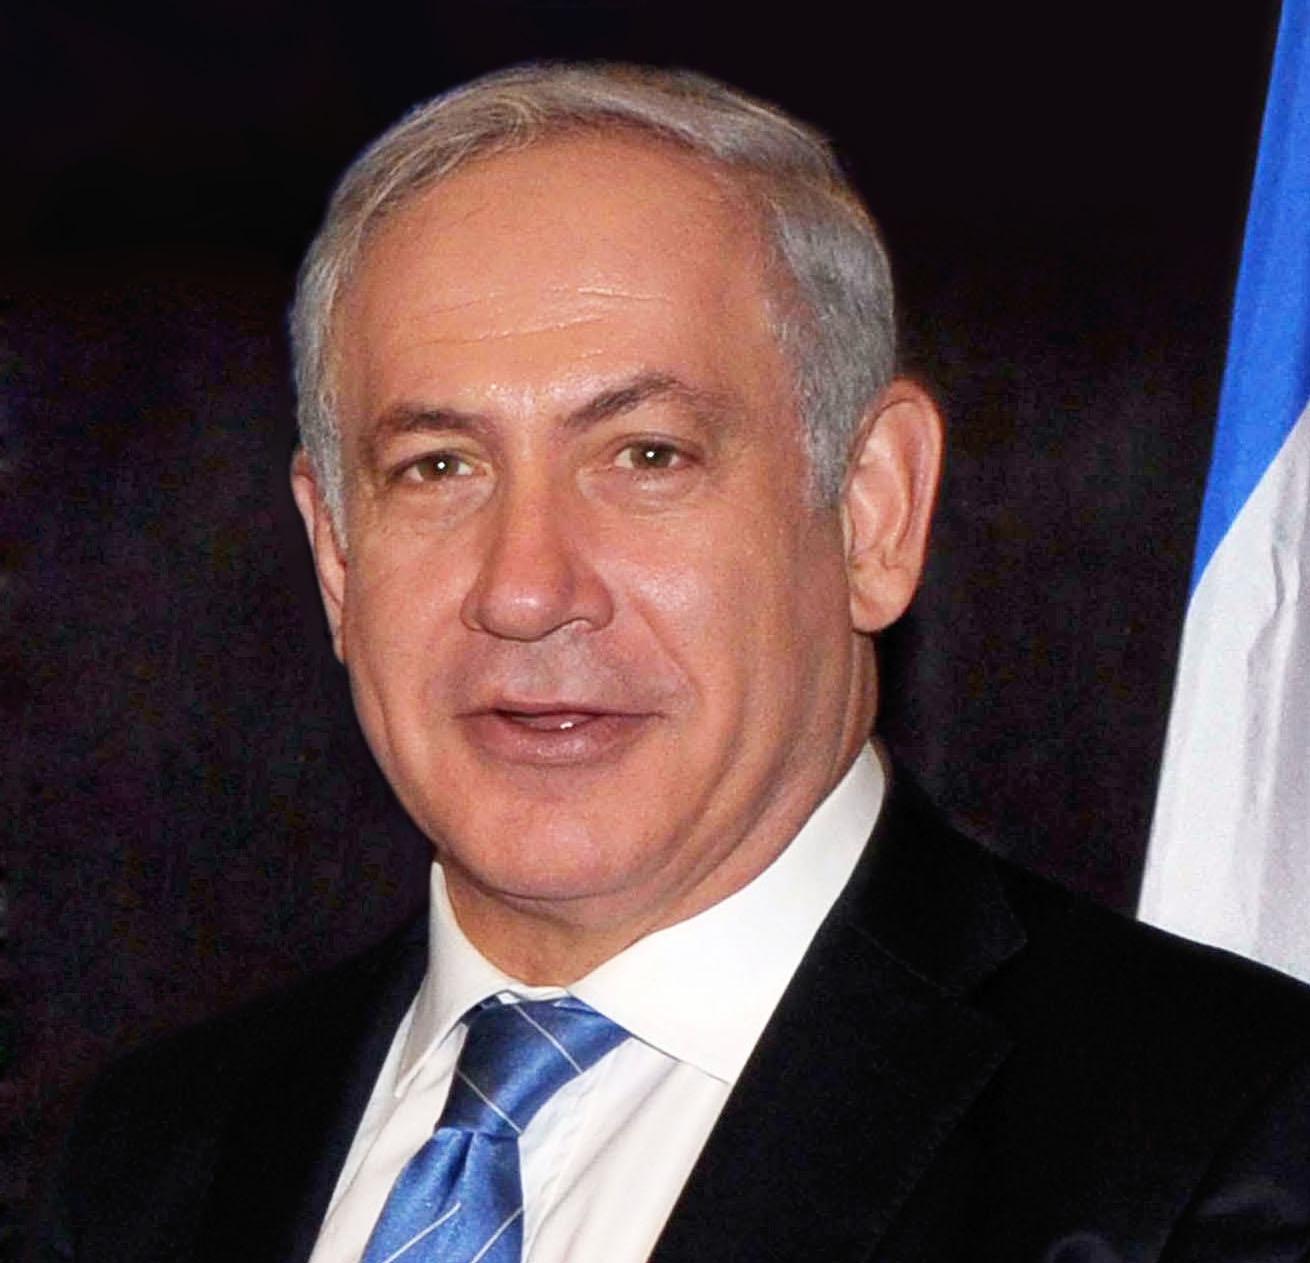 Primo ministro di israele Netanyahu